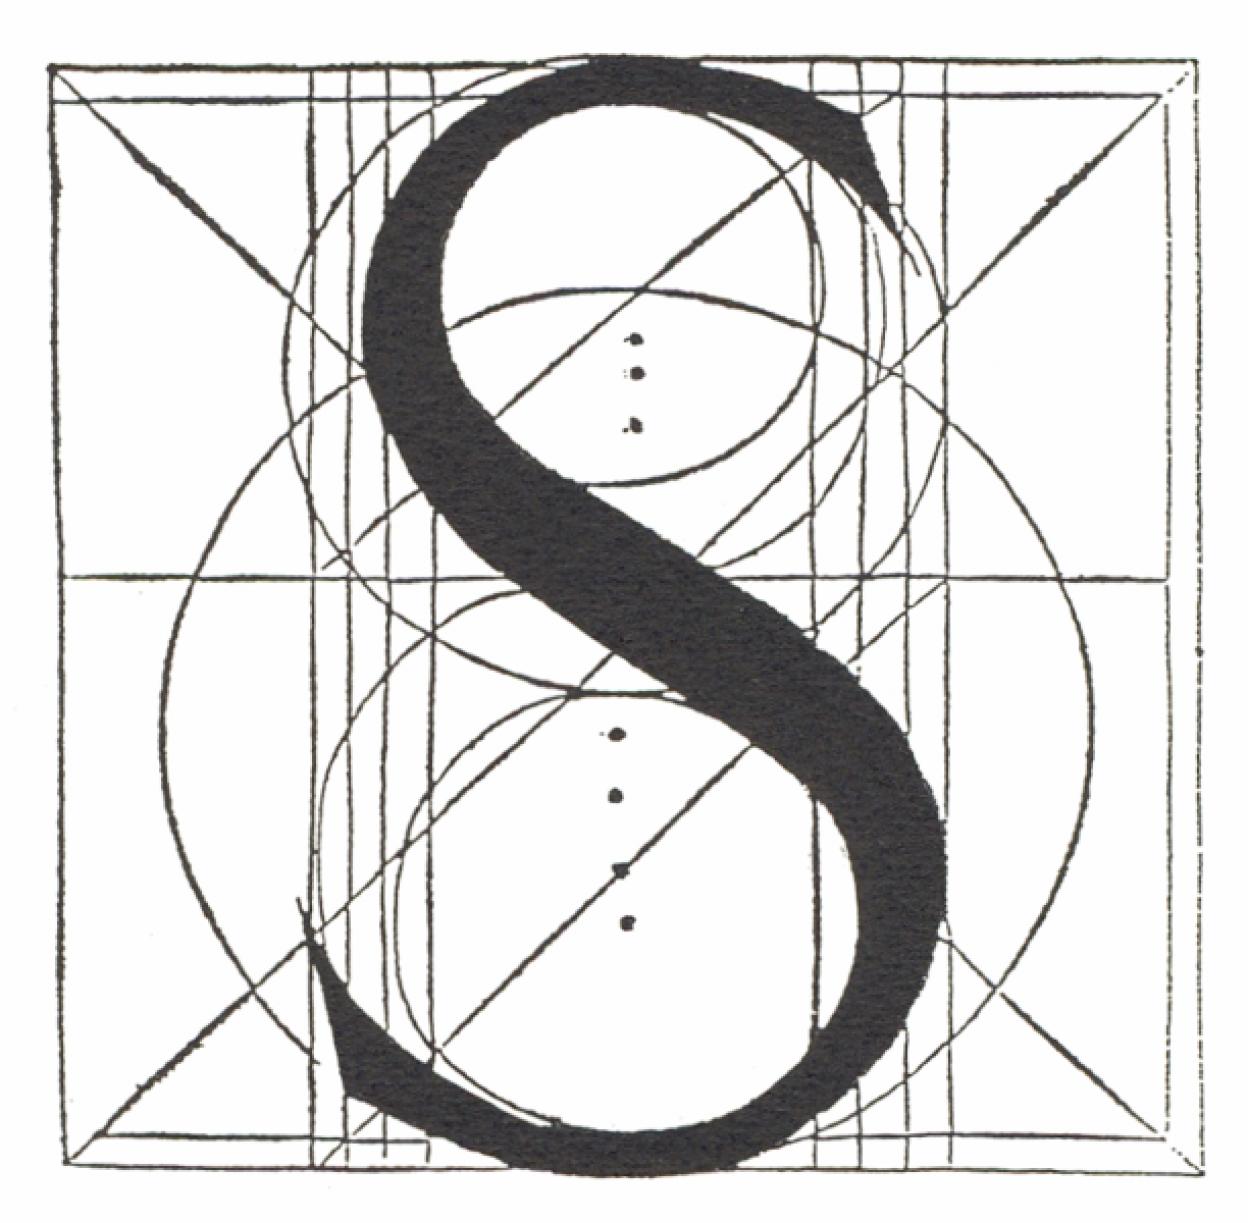 Sebastiano Zonta Architetto